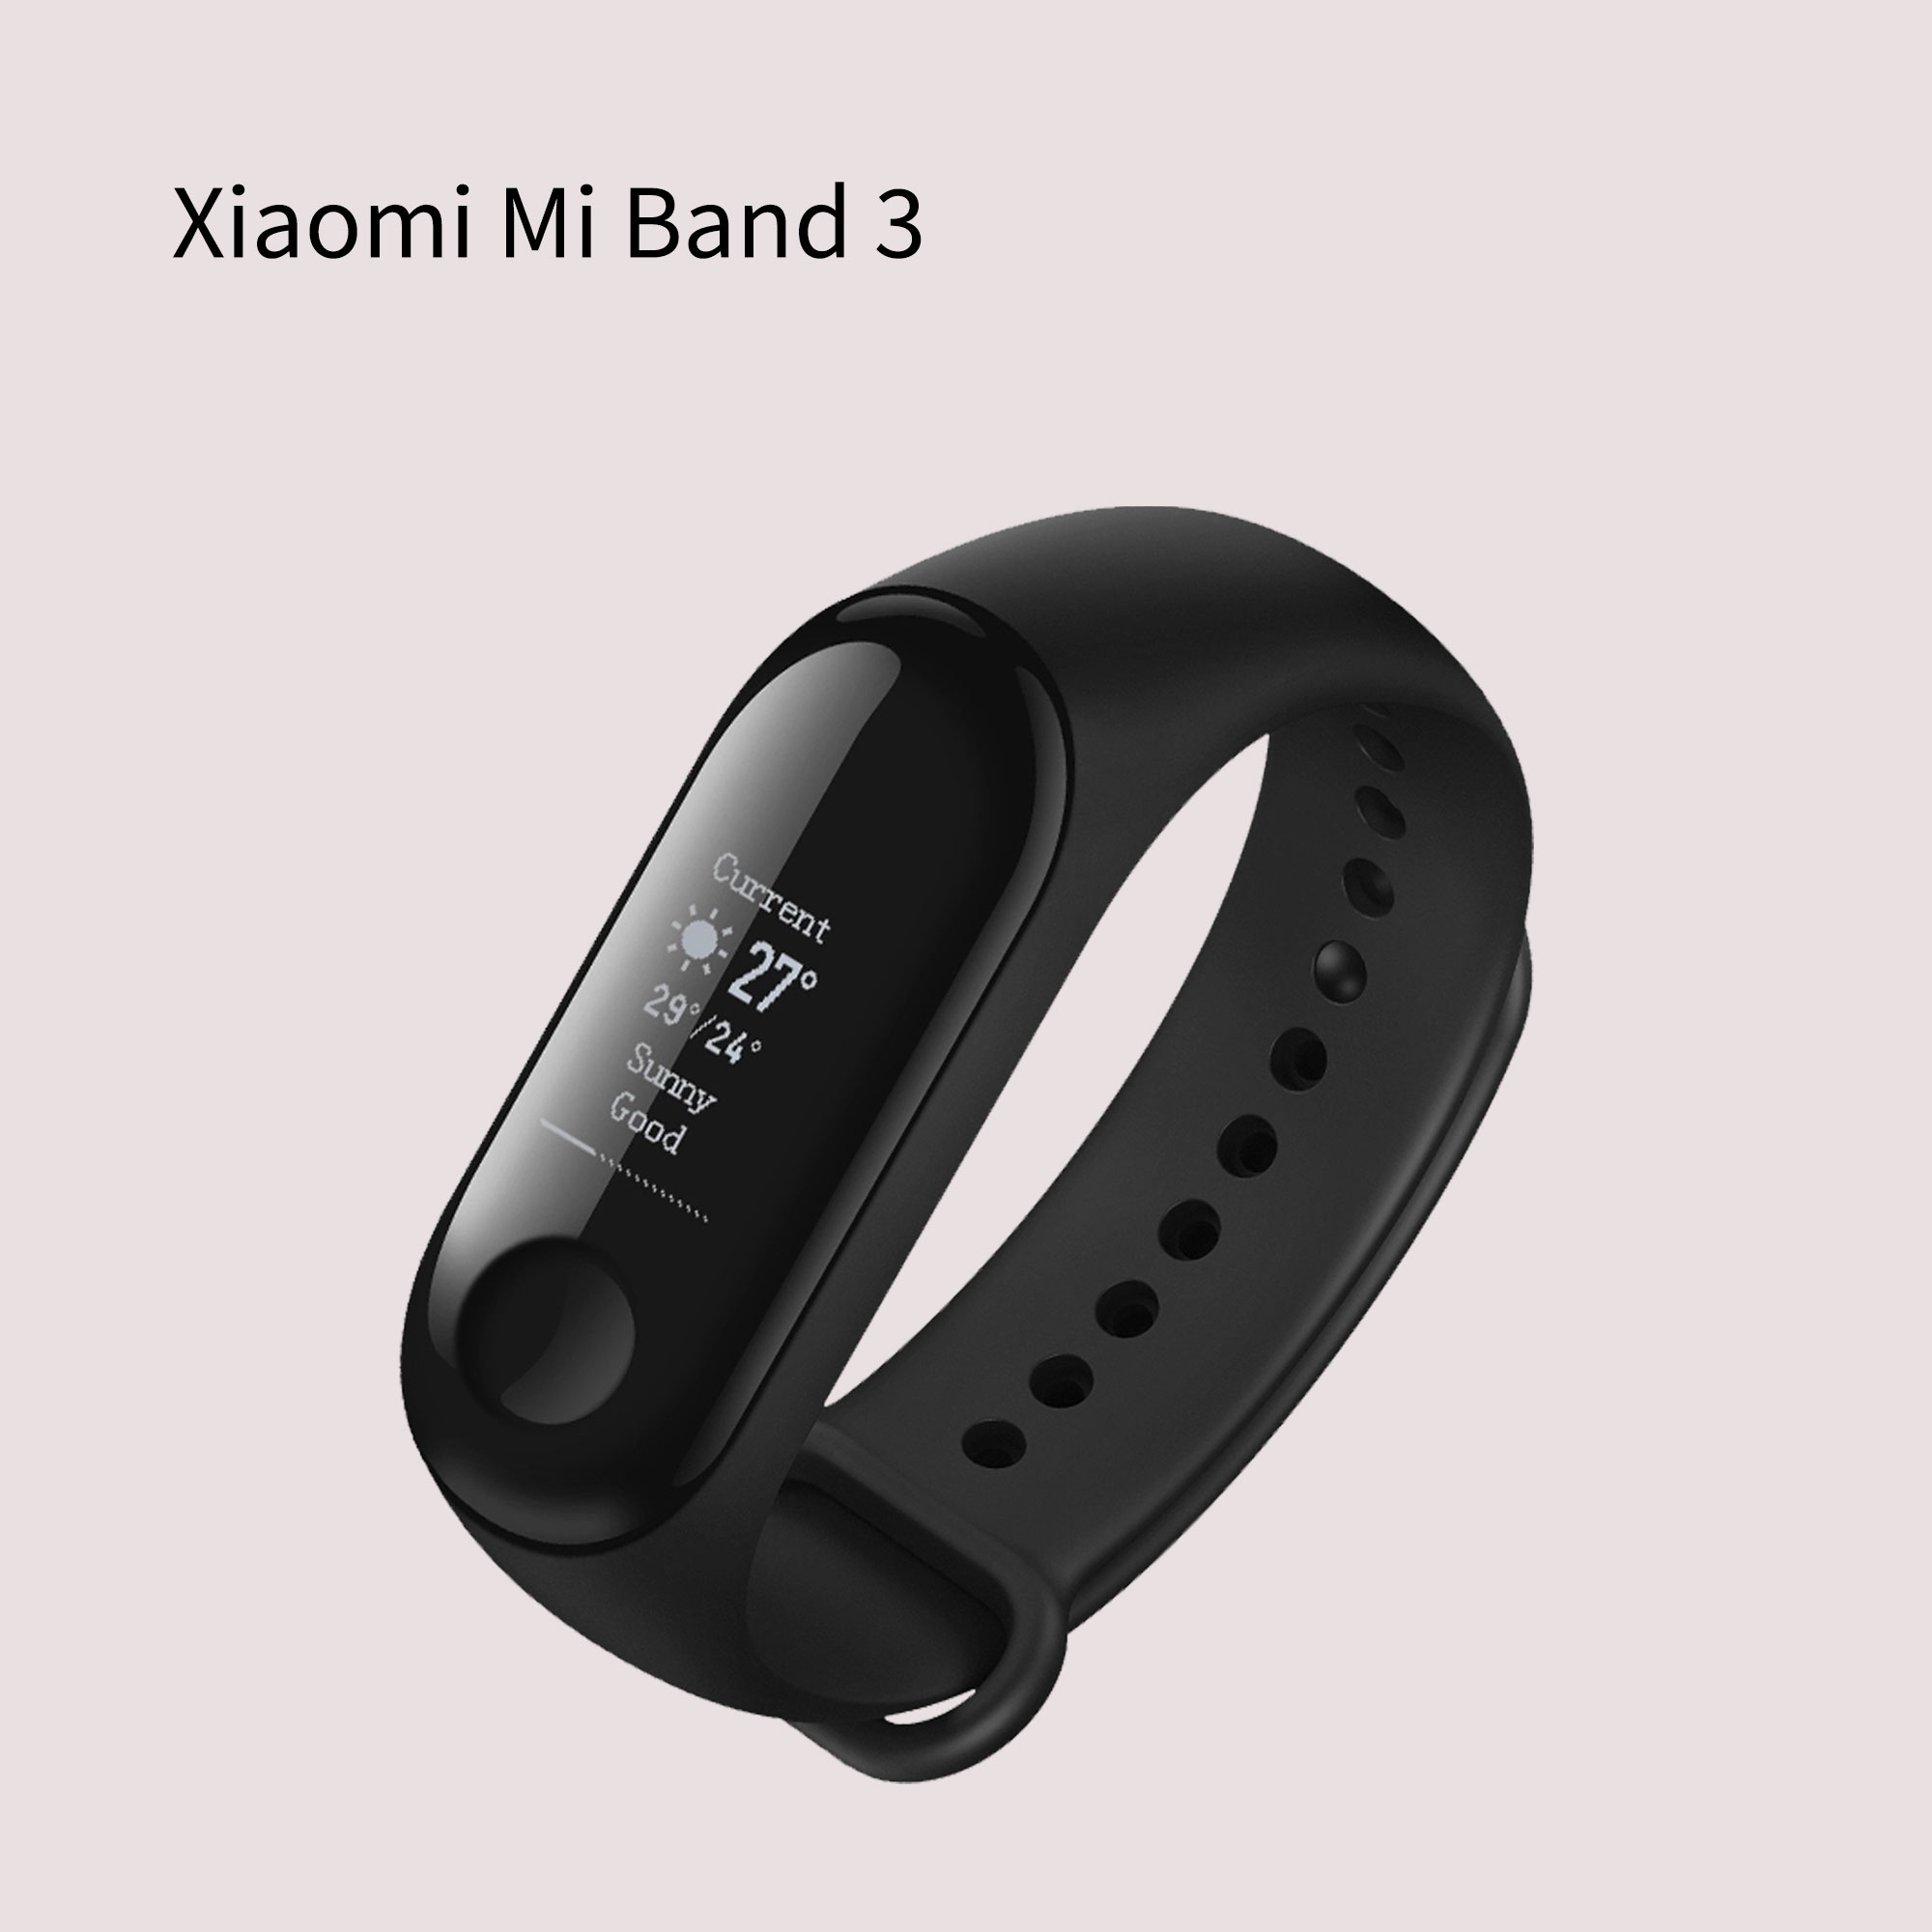 M365 Bluetooth Reset